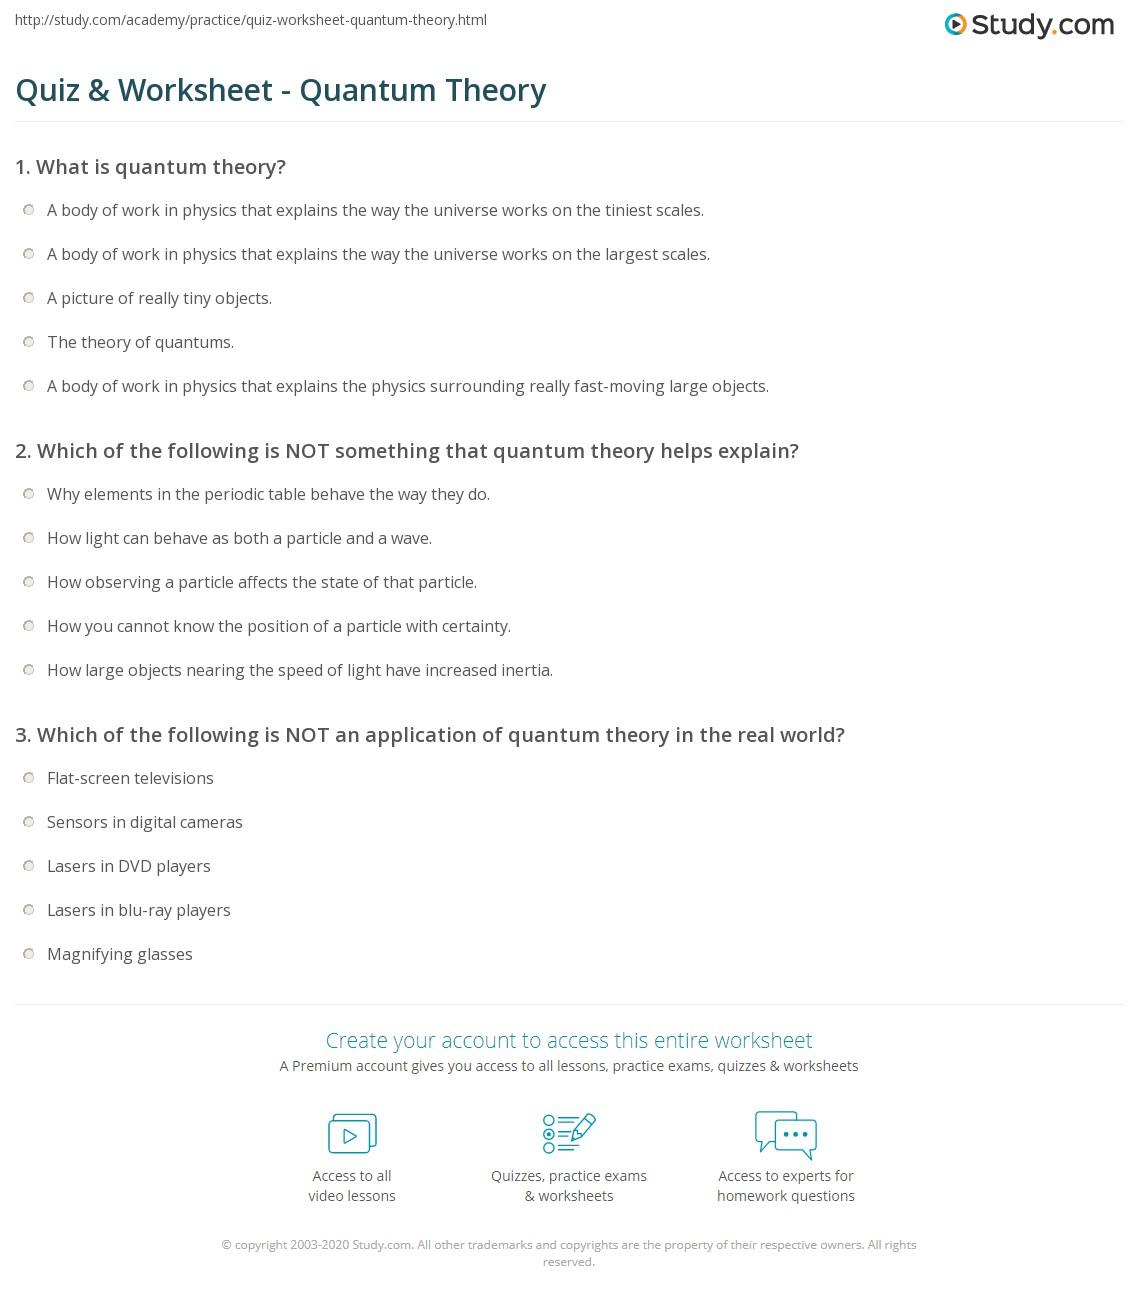 quiz & worksheet - quantum theory | study